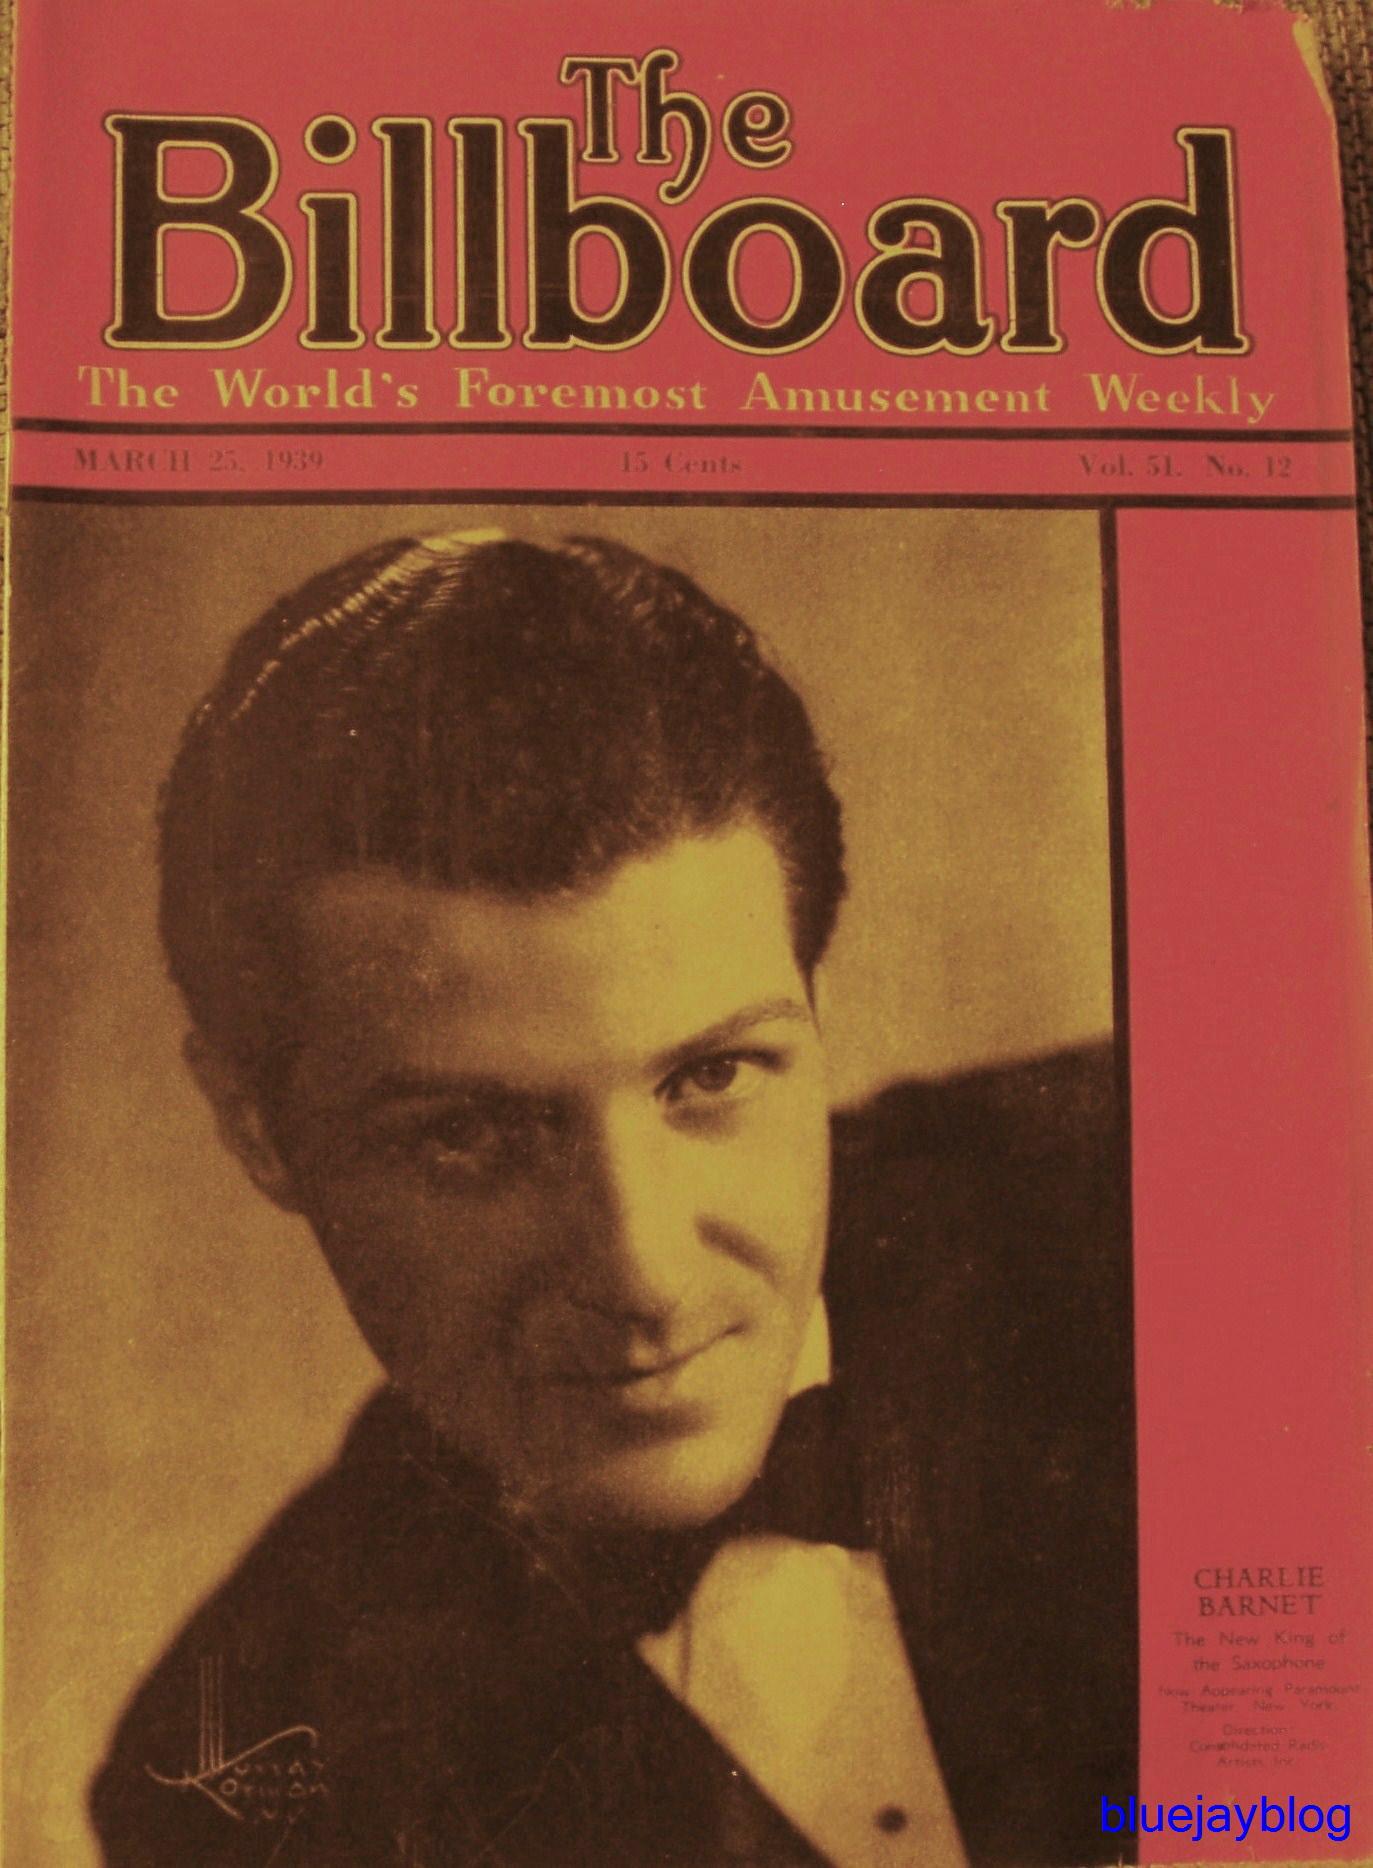 An Old Billboard Magazine   bluejayblog